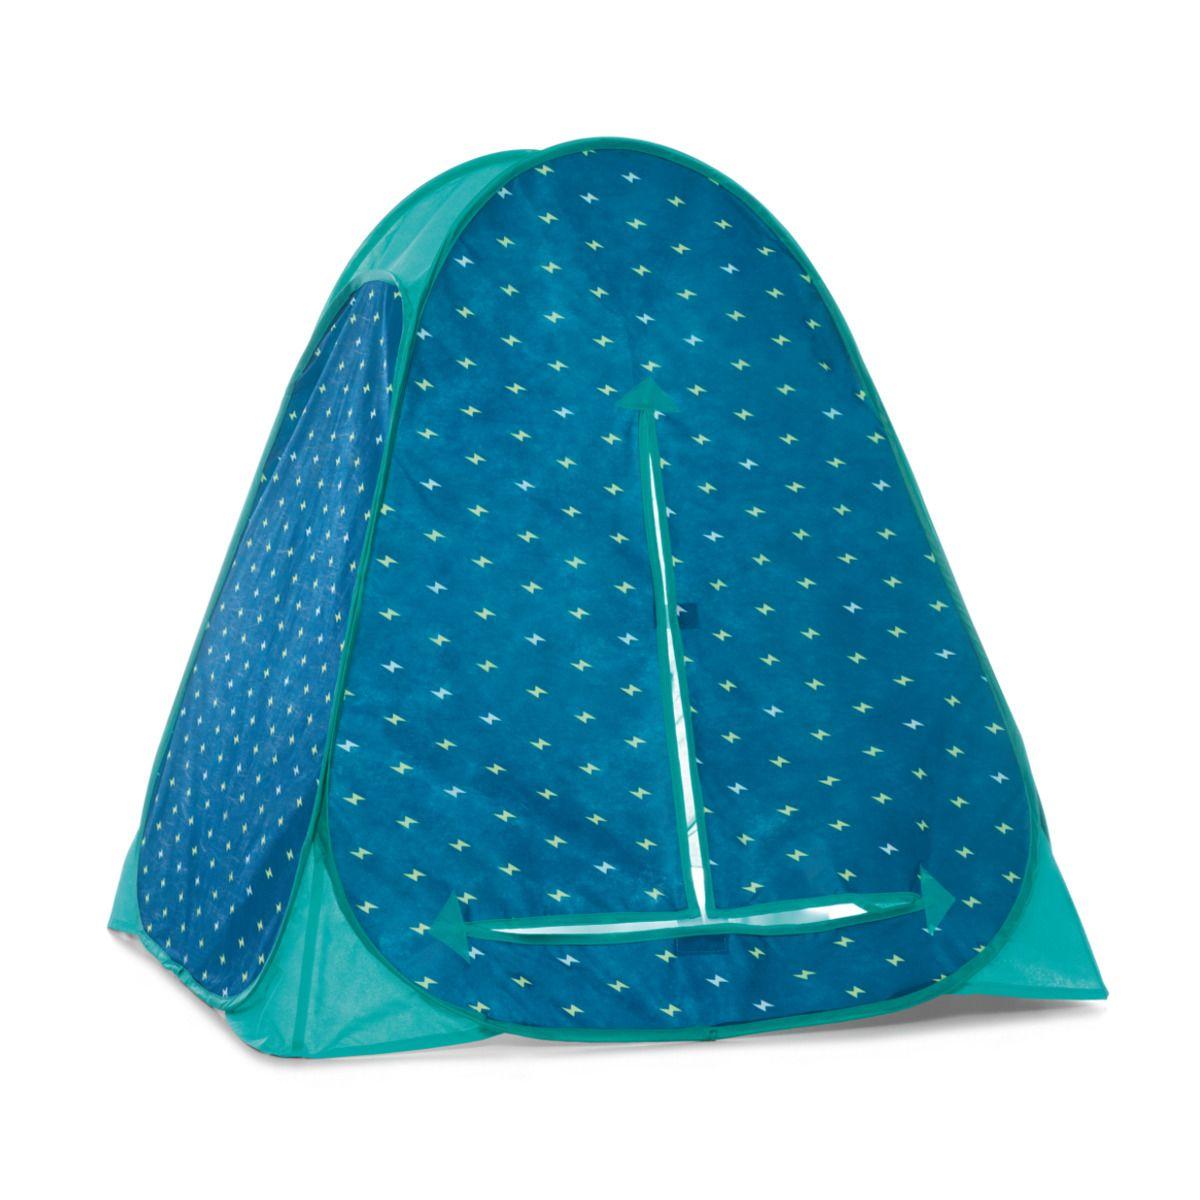 Hideaway Play Tent | Kmart $8  sc 1 st  Pinterest & Hideaway Play Tent | Kmart $8 | Xander Gray | Pinterest